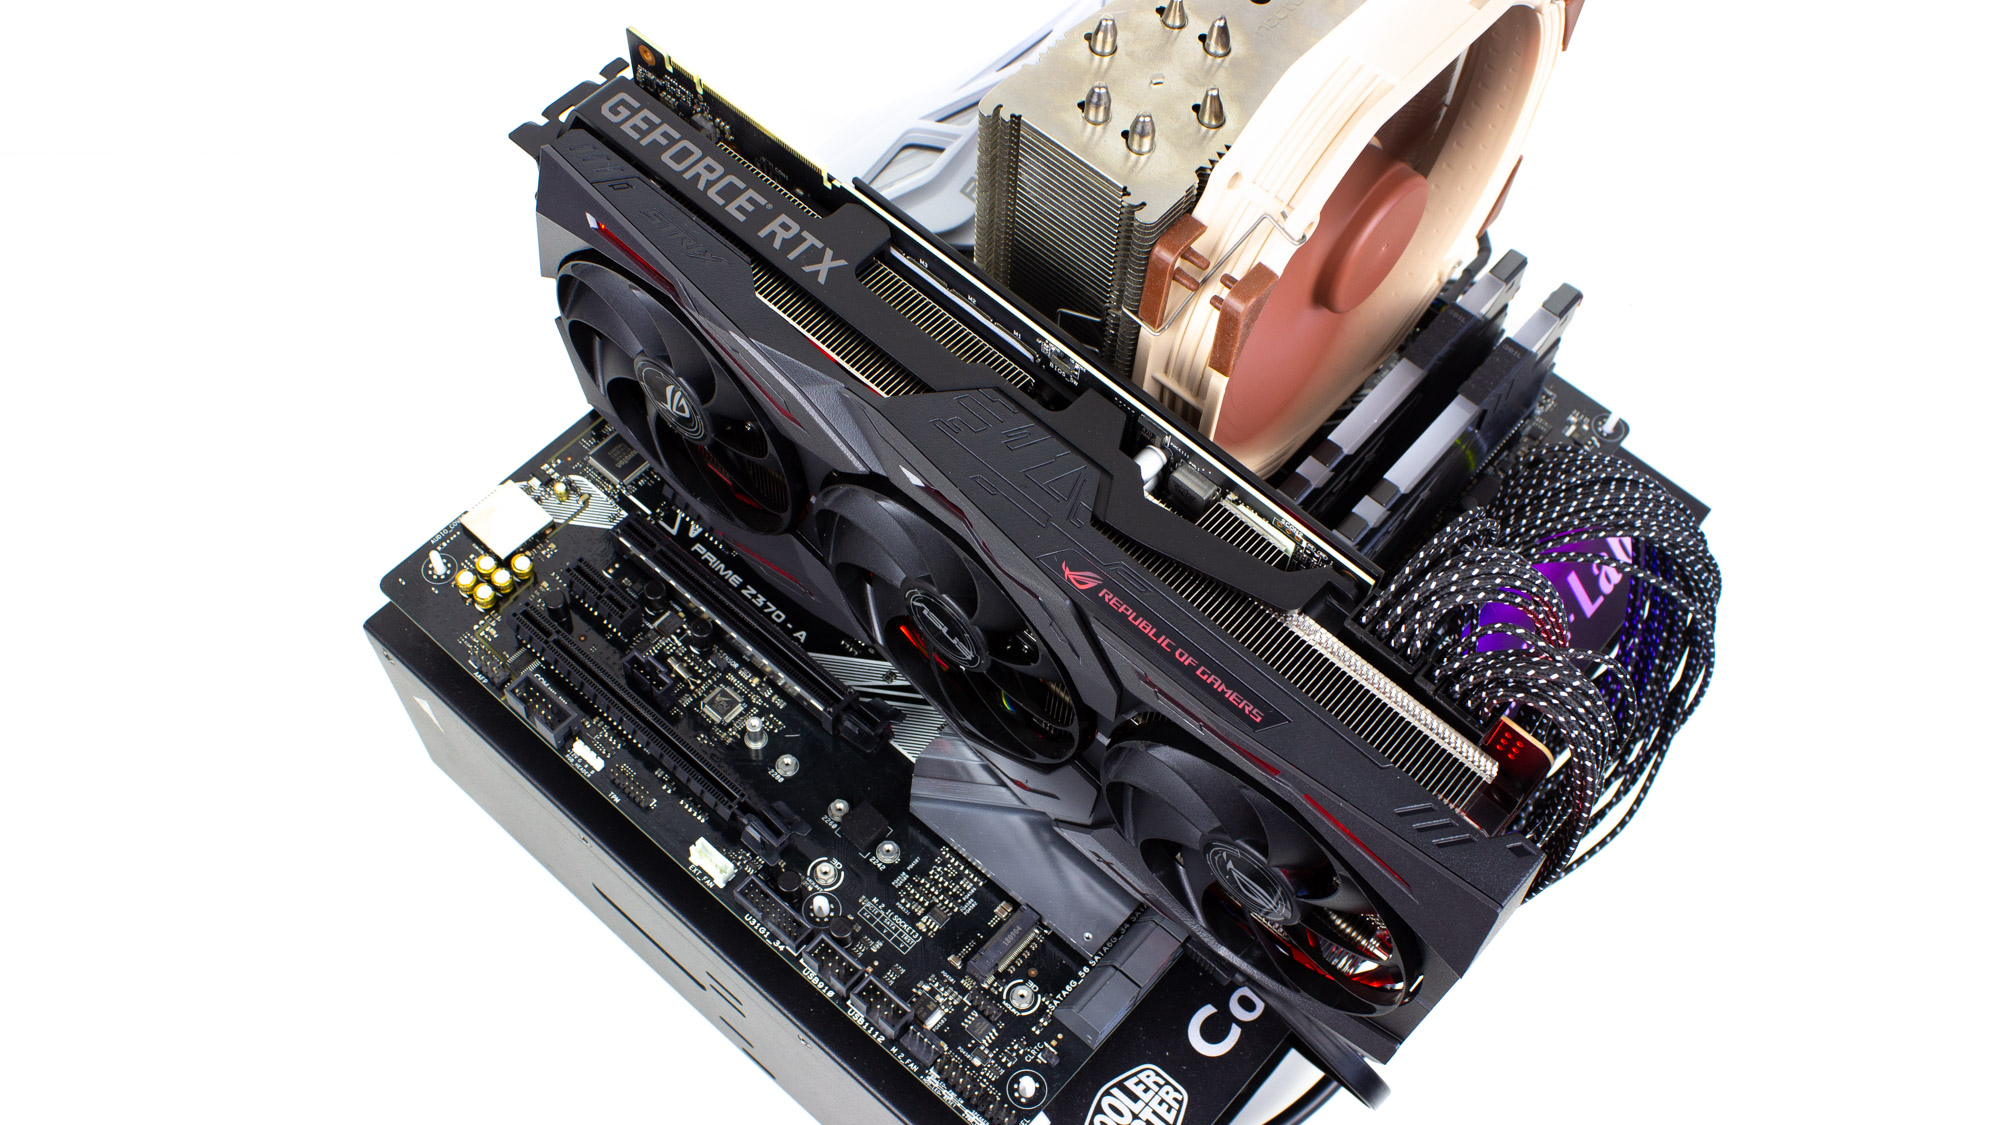 Test: Asus ROG Strix GeForce RTX 2080 Ti OC - Allround-PC com